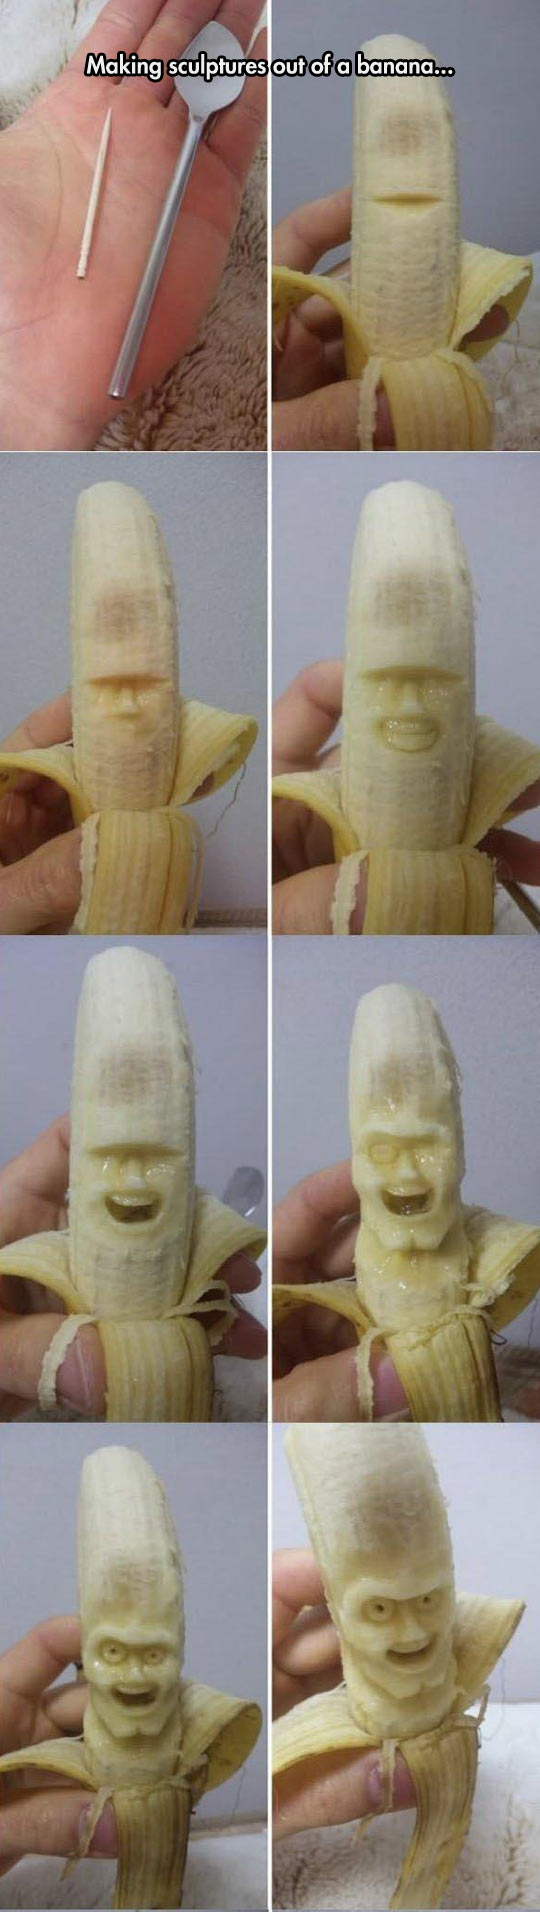 Making Banana Sculptures